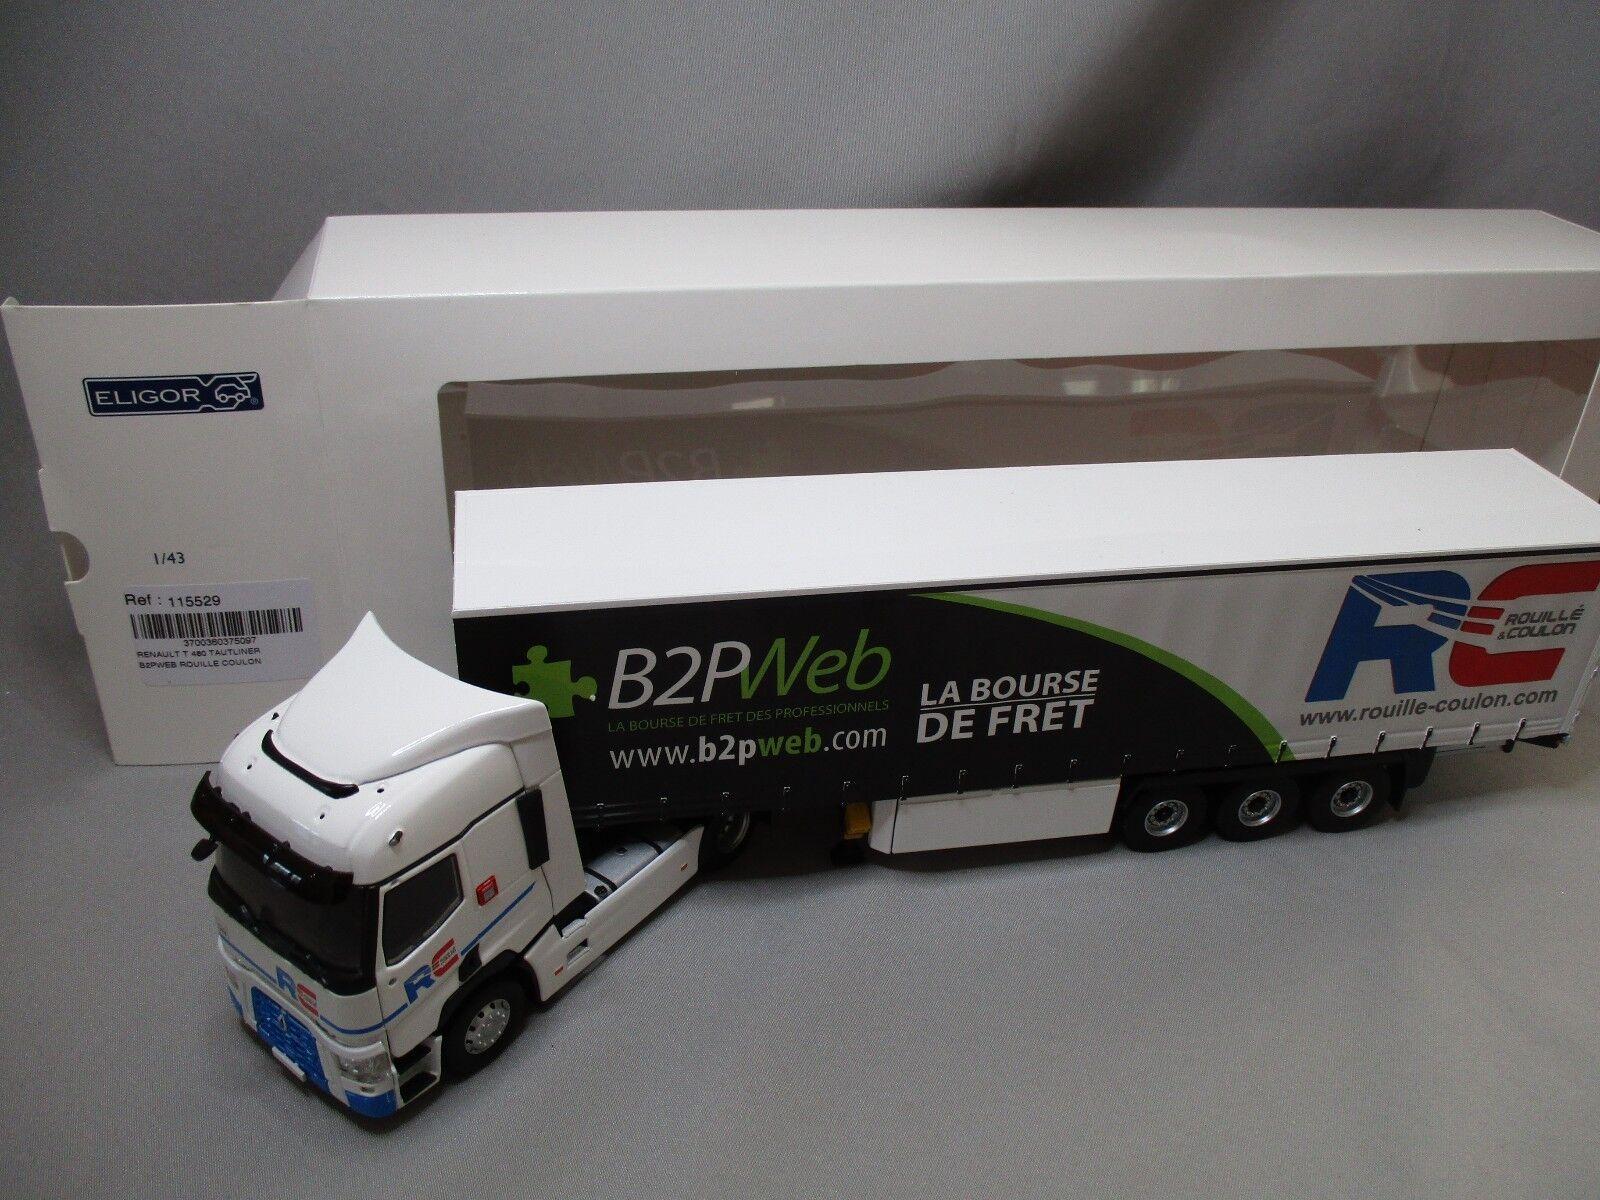 DV8184 ELIGOR 1/43 RENAULT T460 SEMI TAUTLINER TPS TPS TPS B2PWeb ROUILLE COULON 115529 f17a77